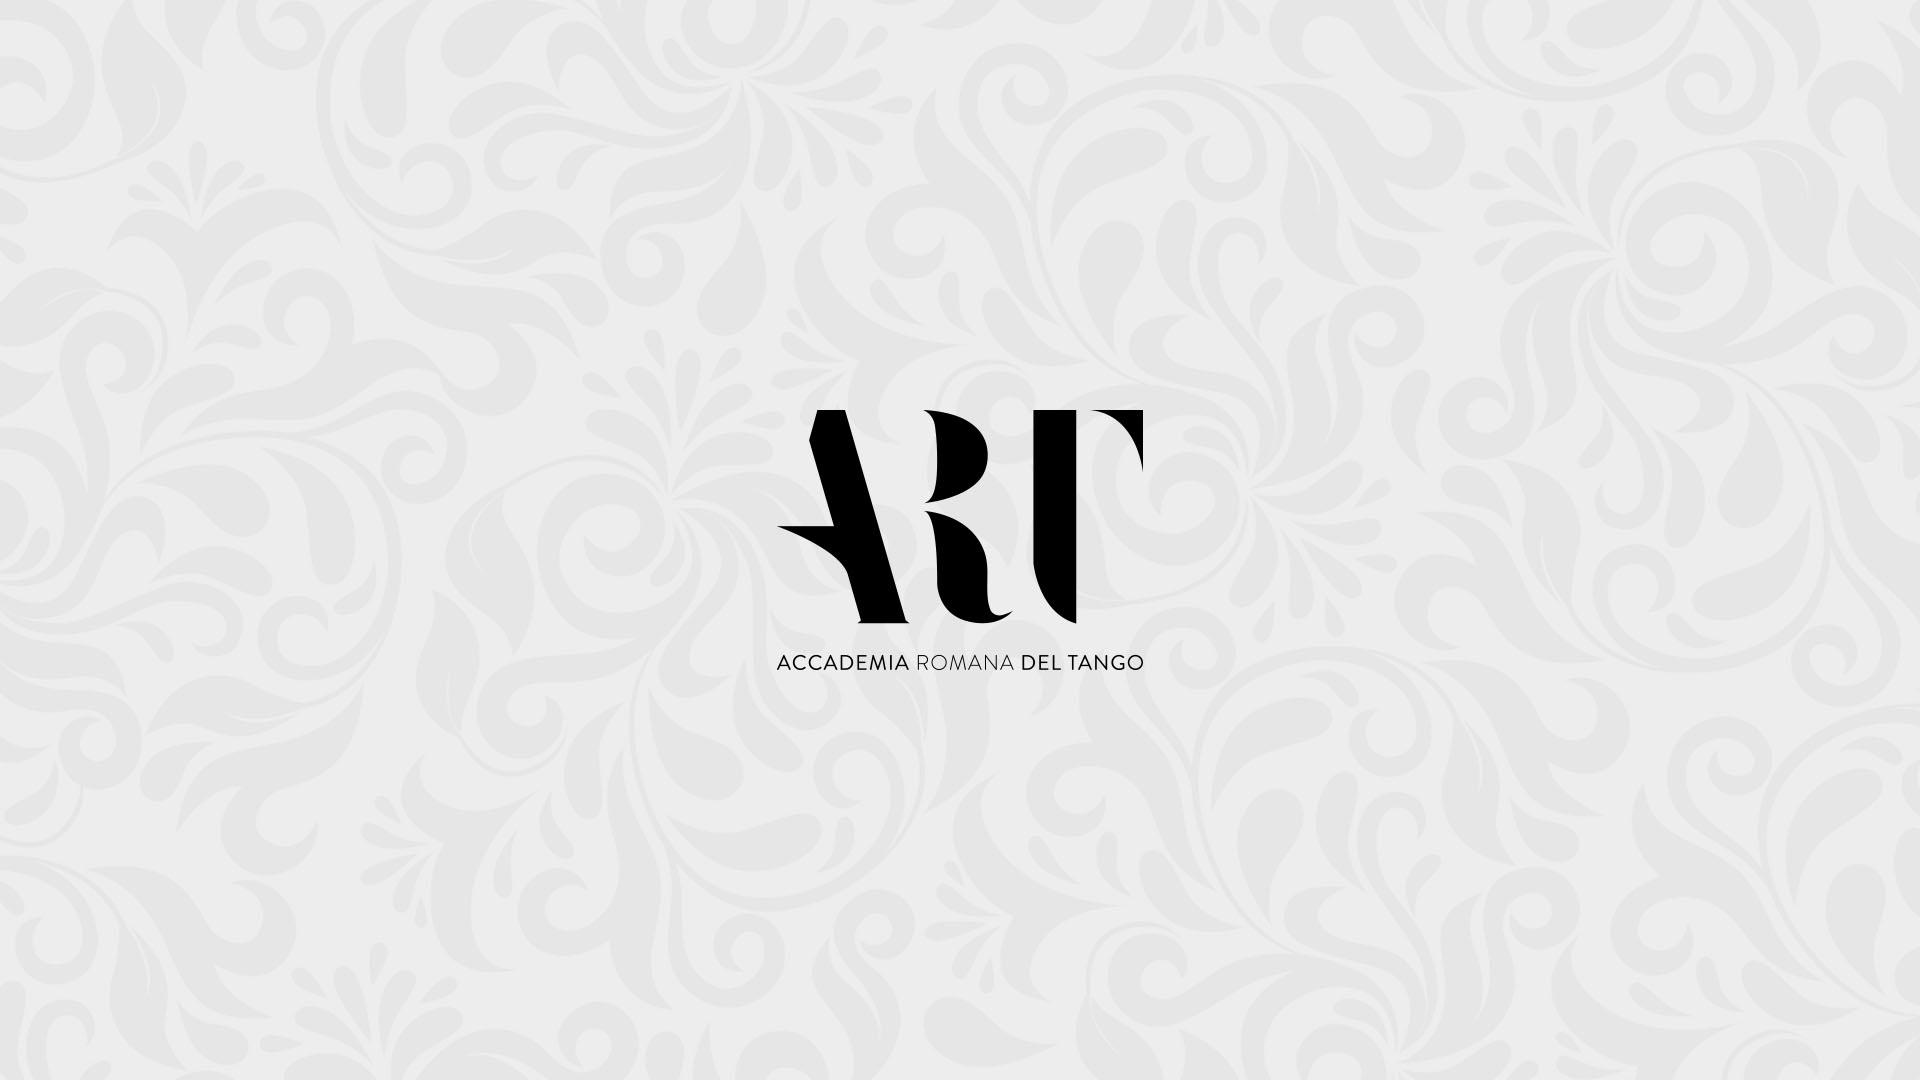 accademia-romana-del-tango-10_assecommunication